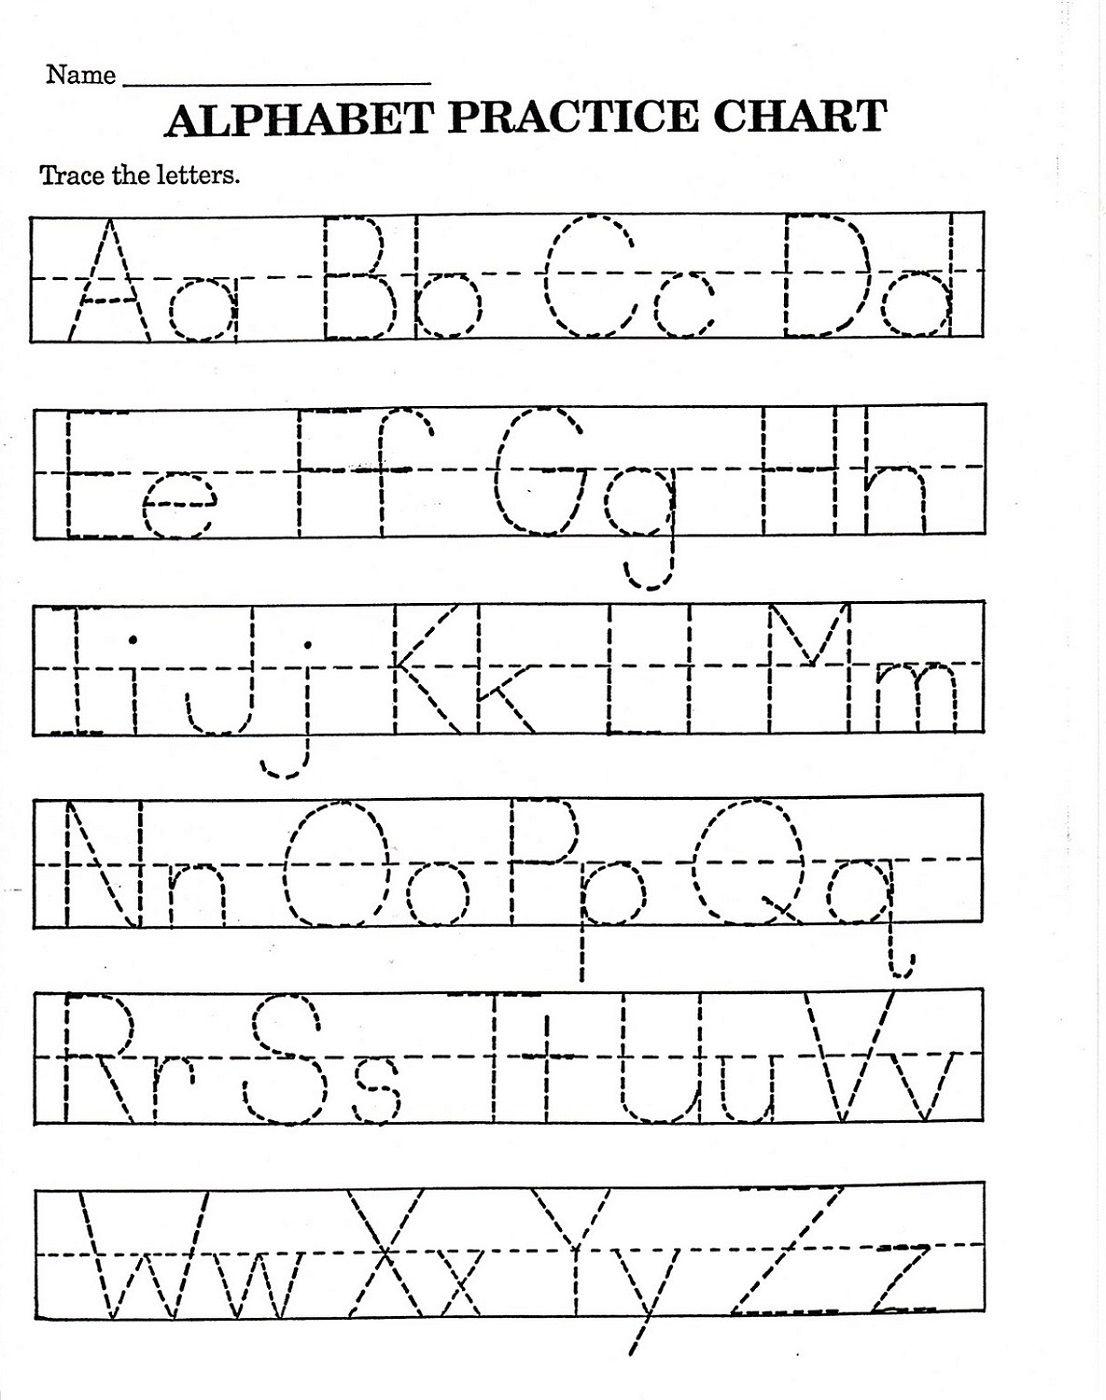 Coloring Book : Printable Alphabet Stencils Free Tracing regarding Tracing Stencils Letters